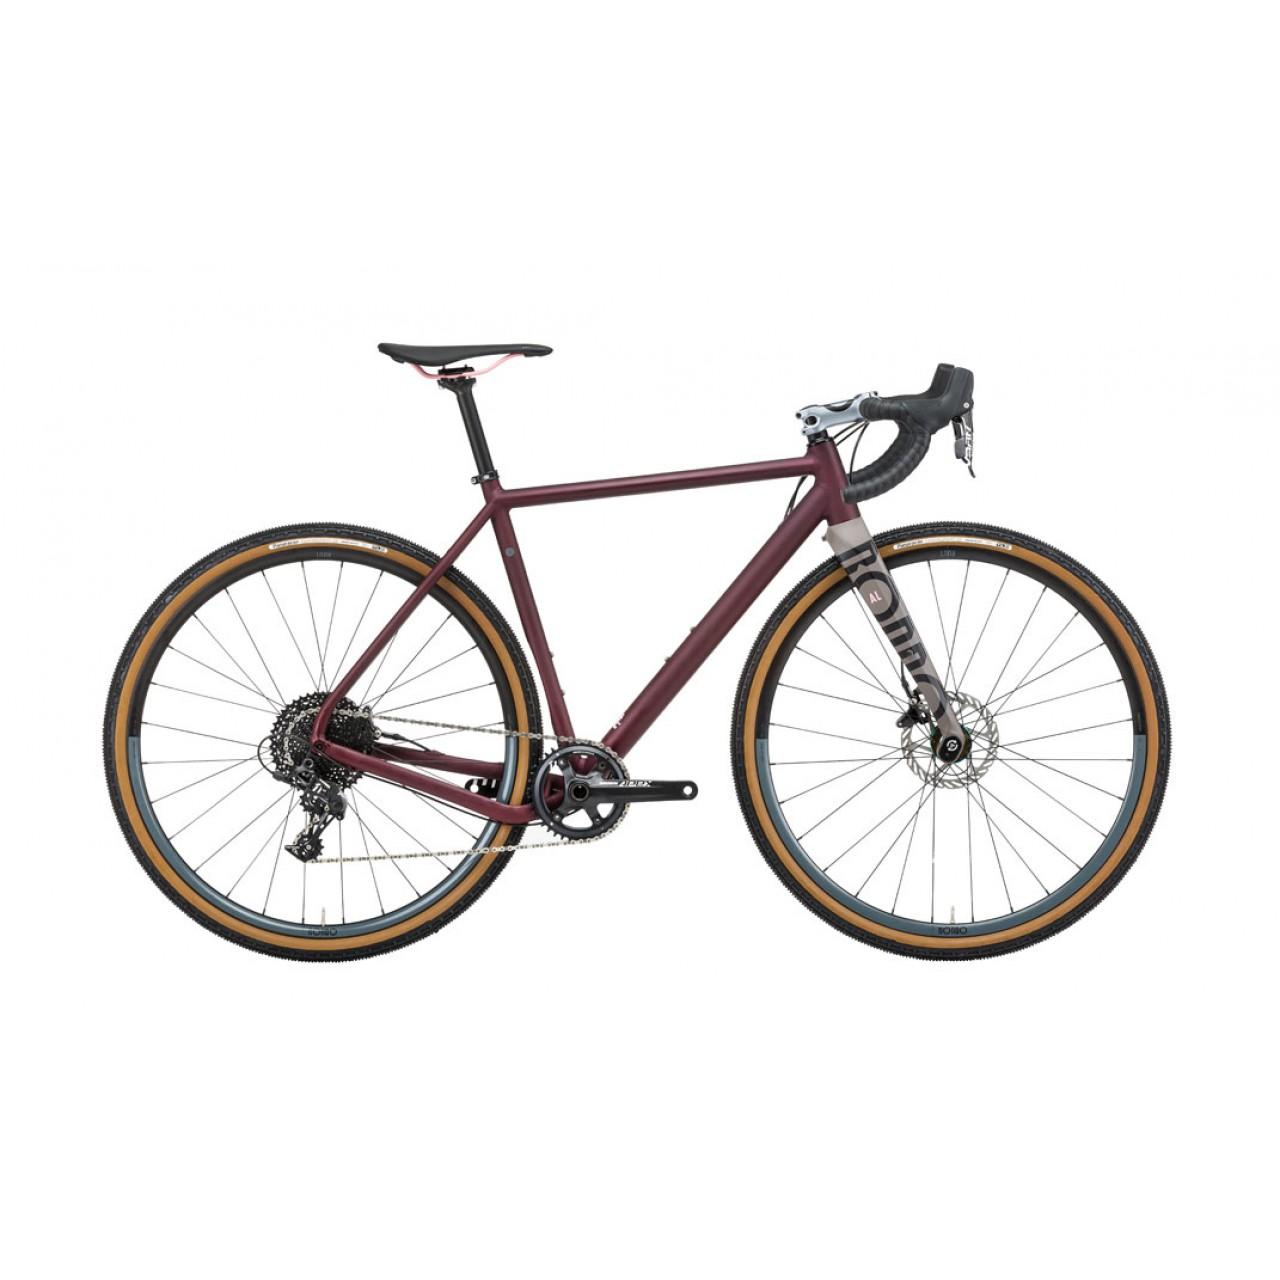 Rondo Ruut Al Complete Bike 2018 1 899 90